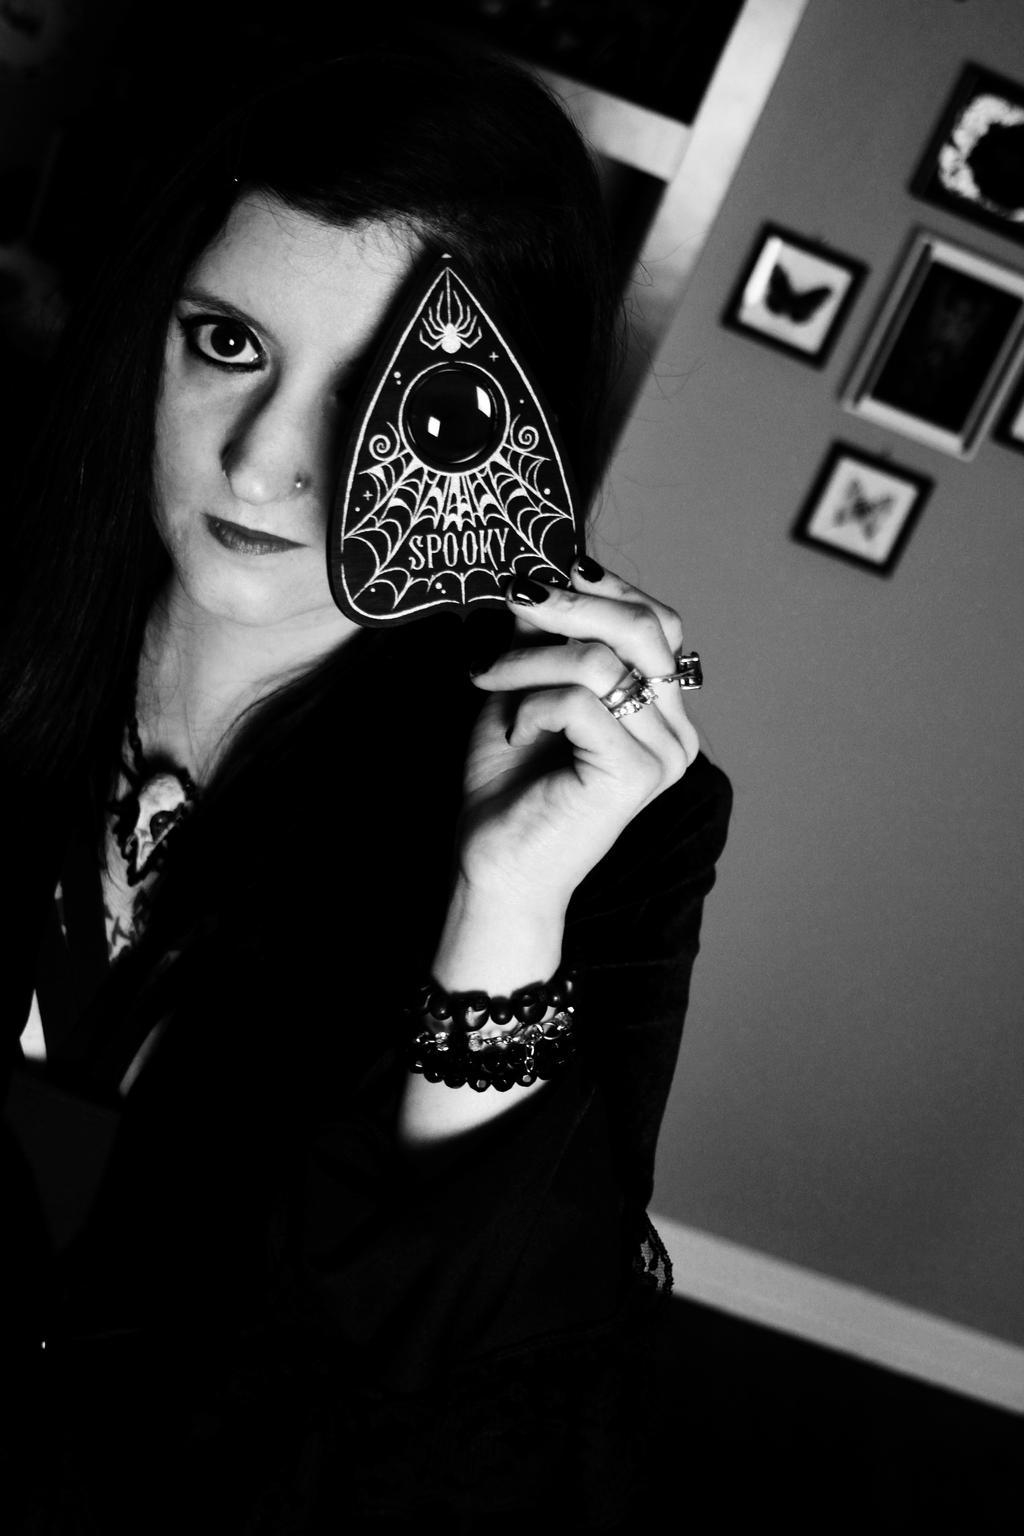 Little-Ms-Spooky's Profile Picture